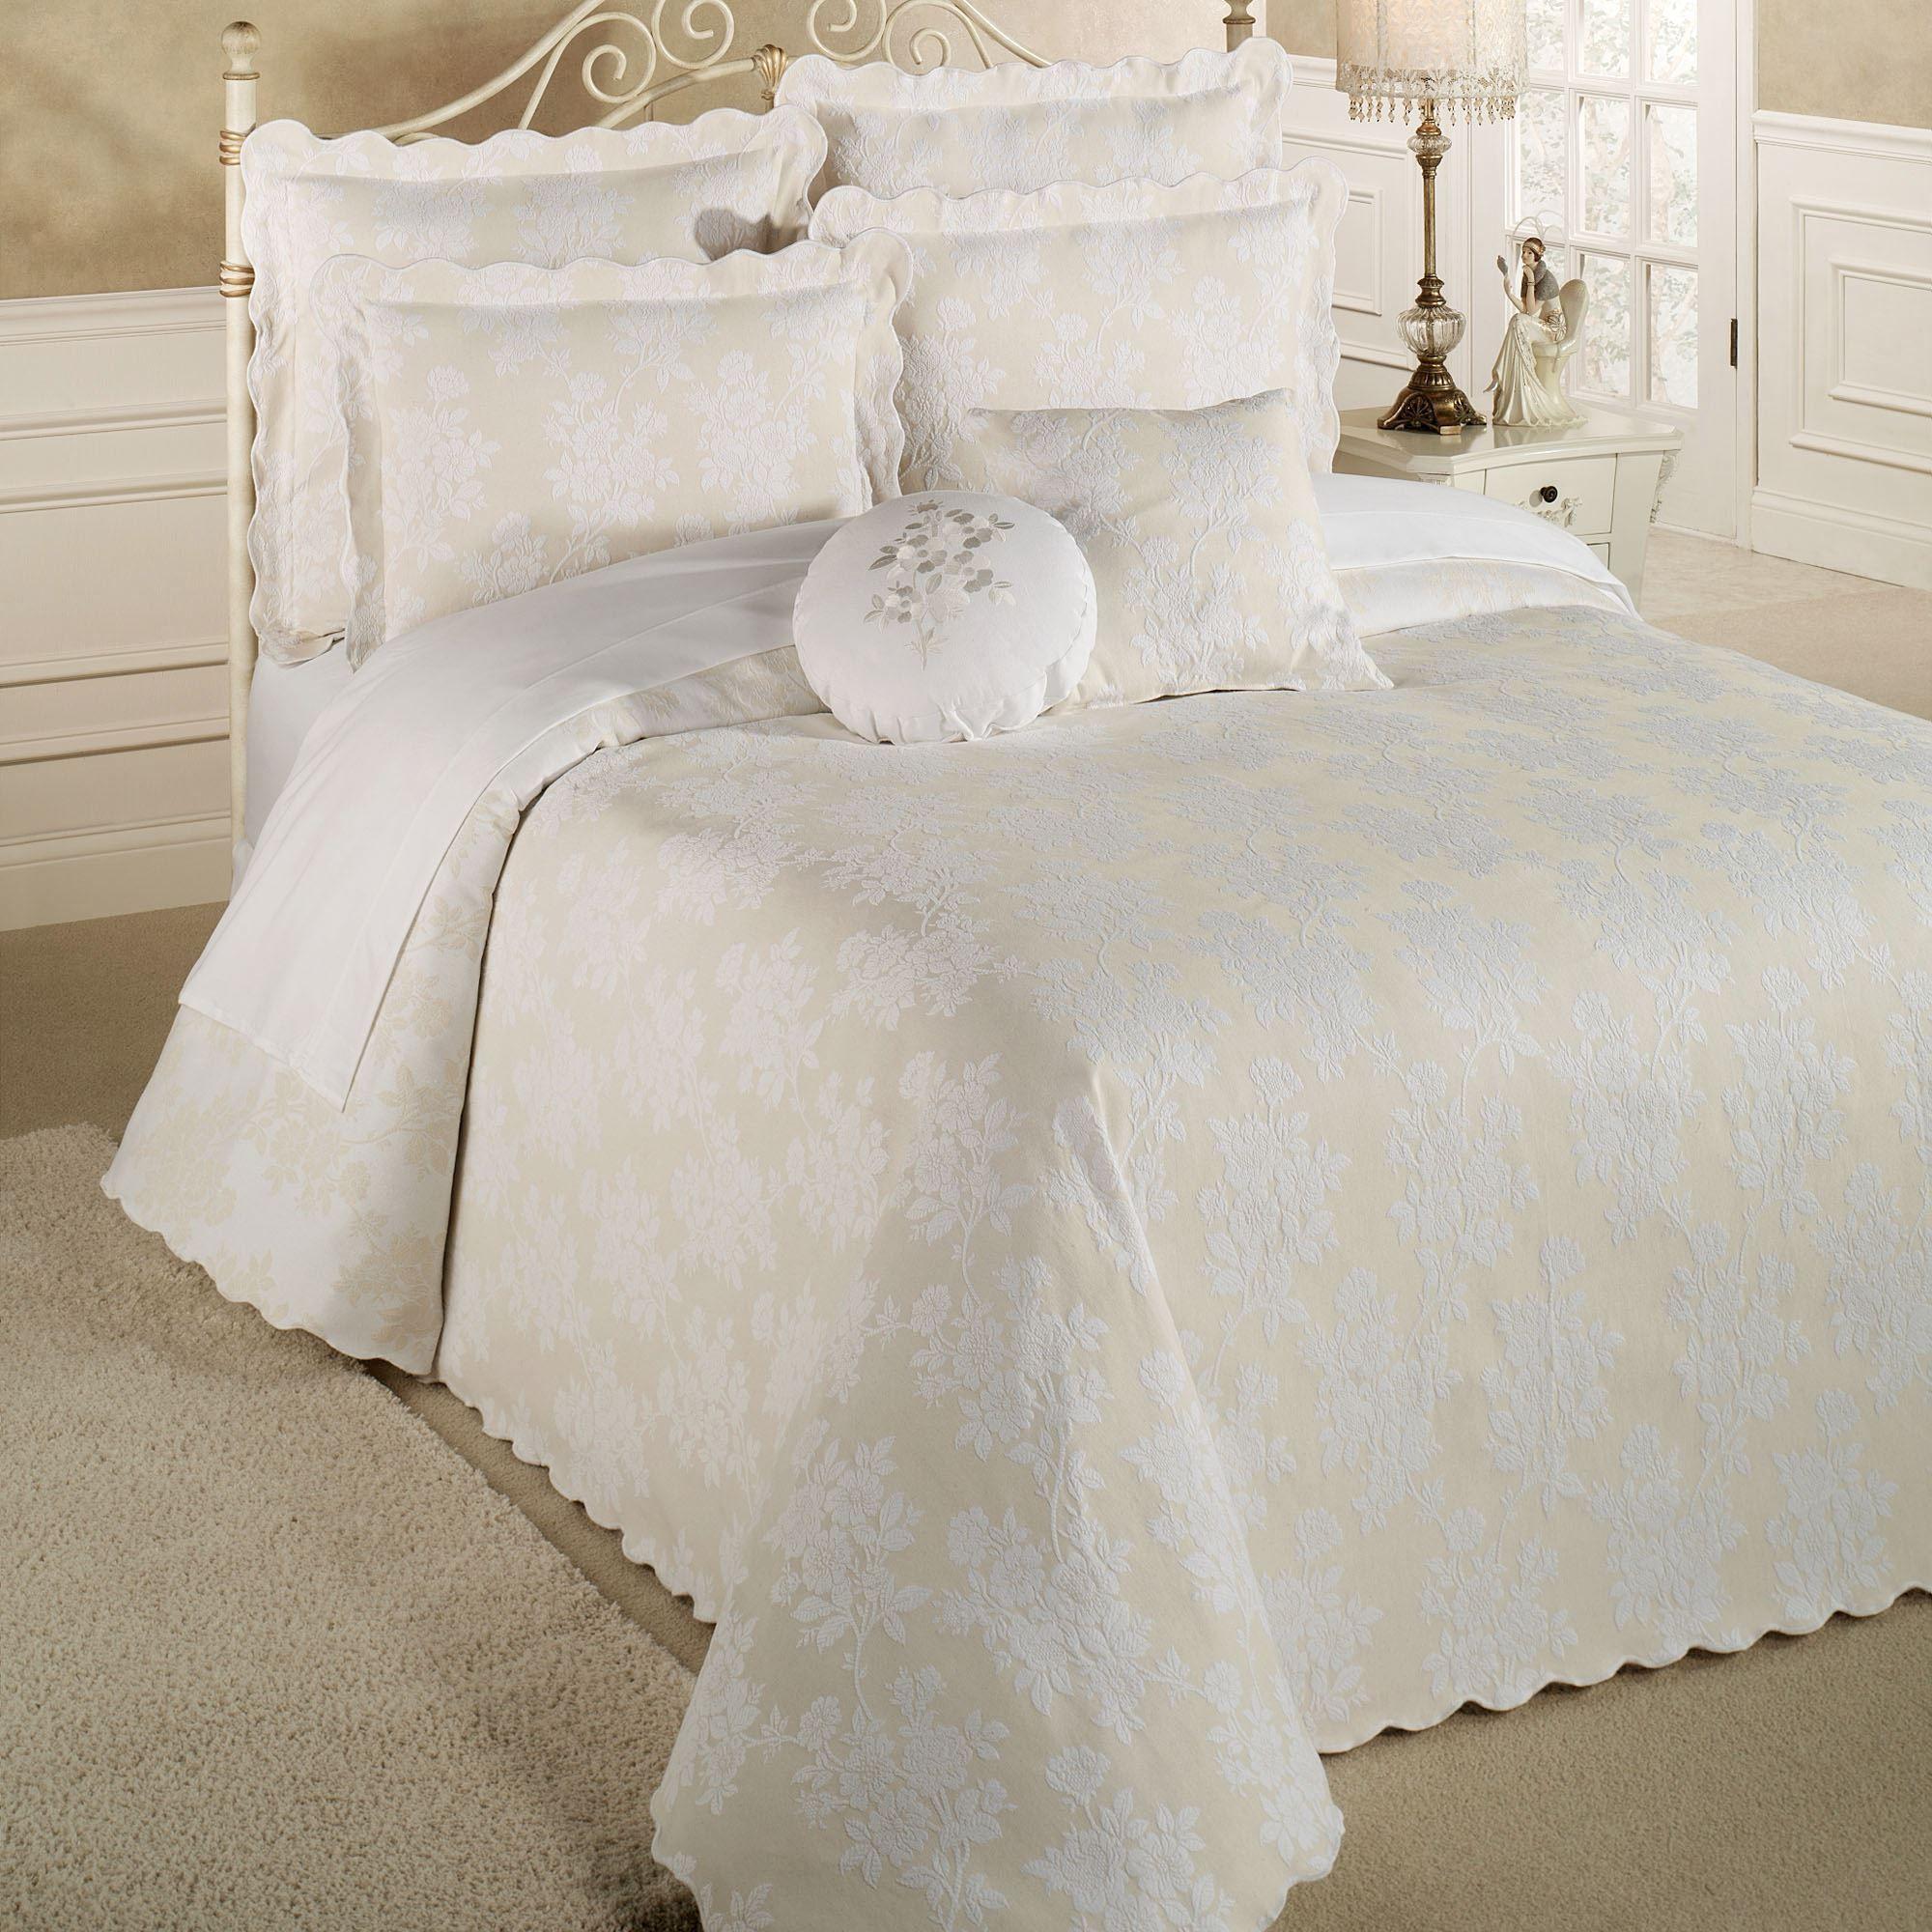 Floral Medley Woven Matelasse Oversized Bedspread Bedding